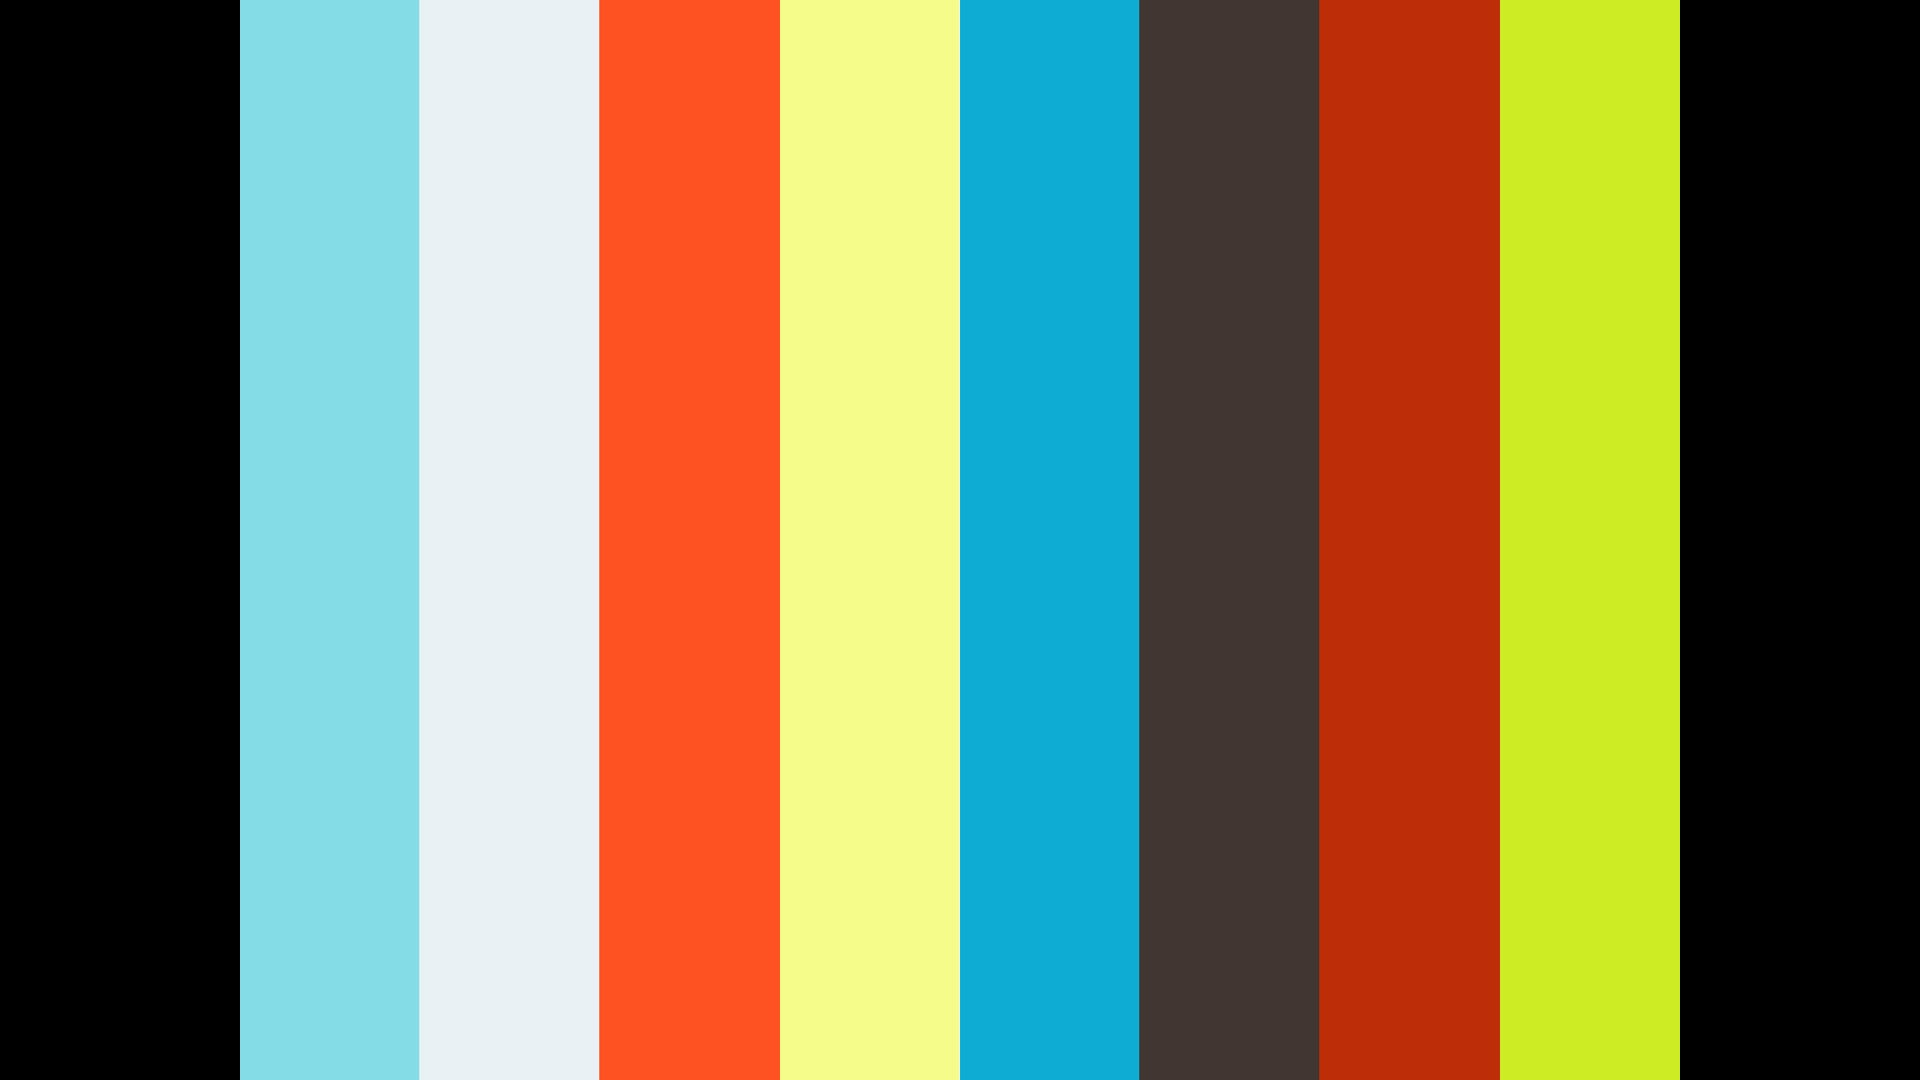 ANIMAL4_TOILEWEB04_VIMEO